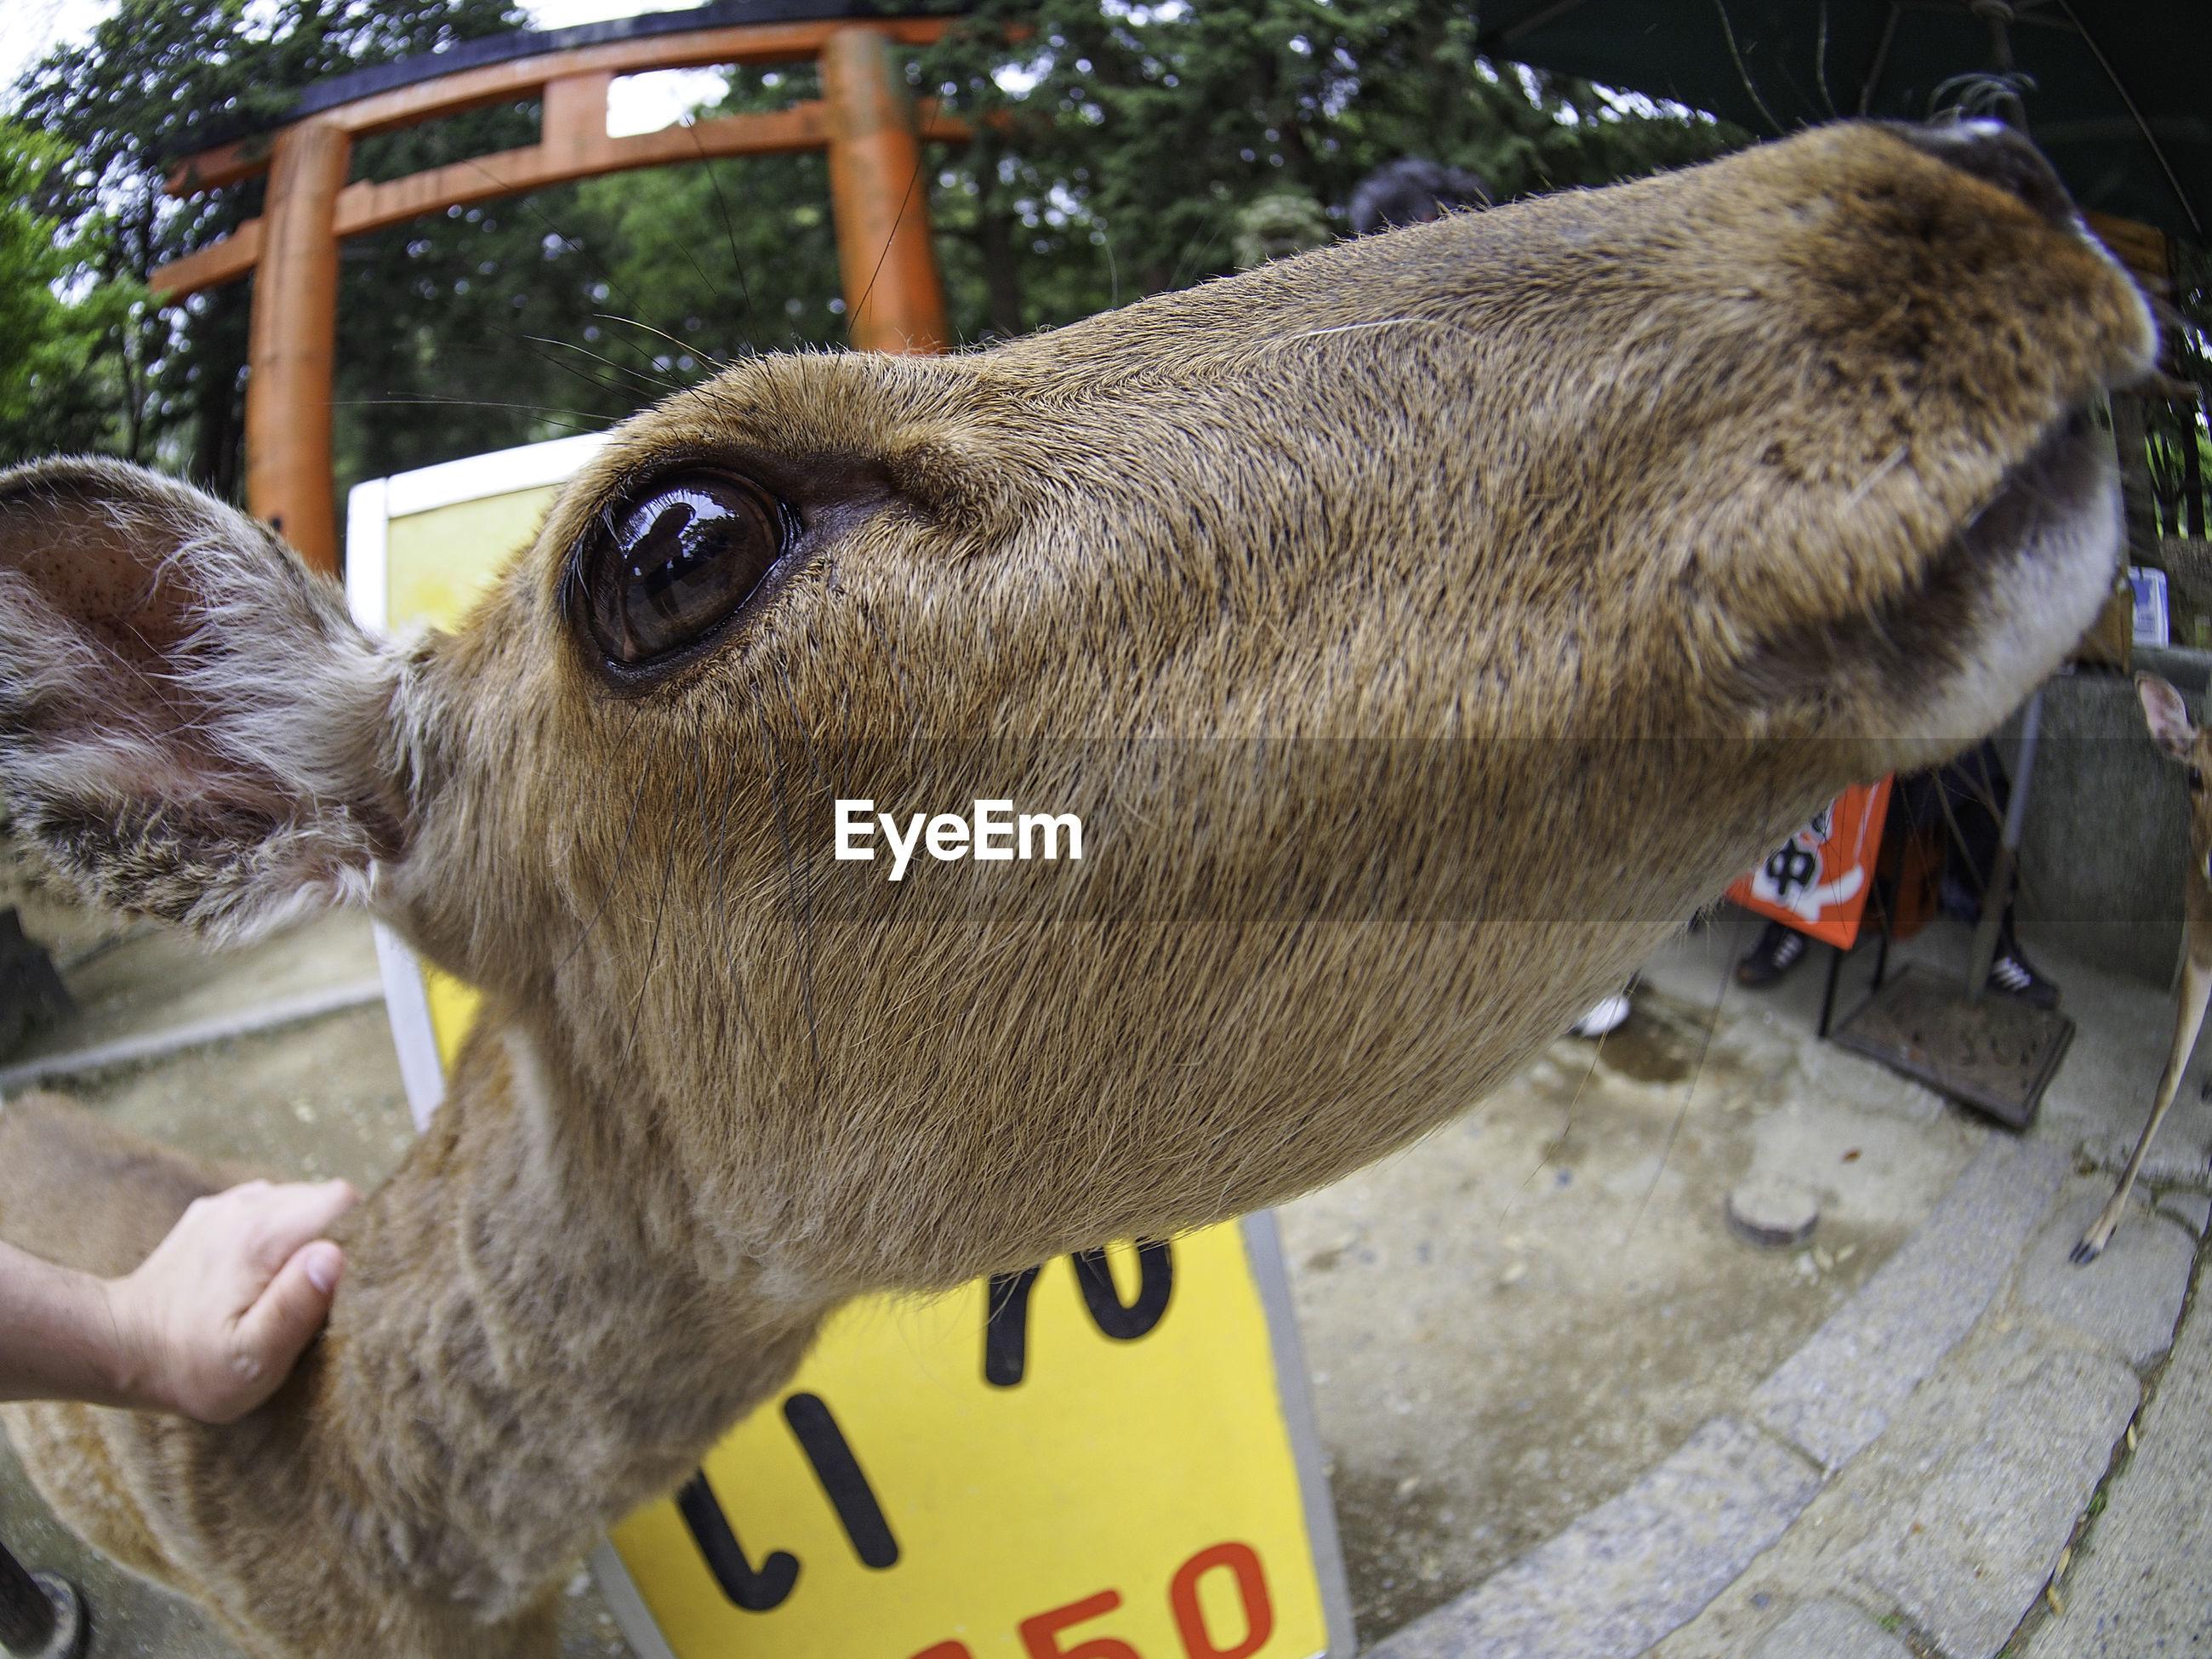 Fish-eye lens view of deer